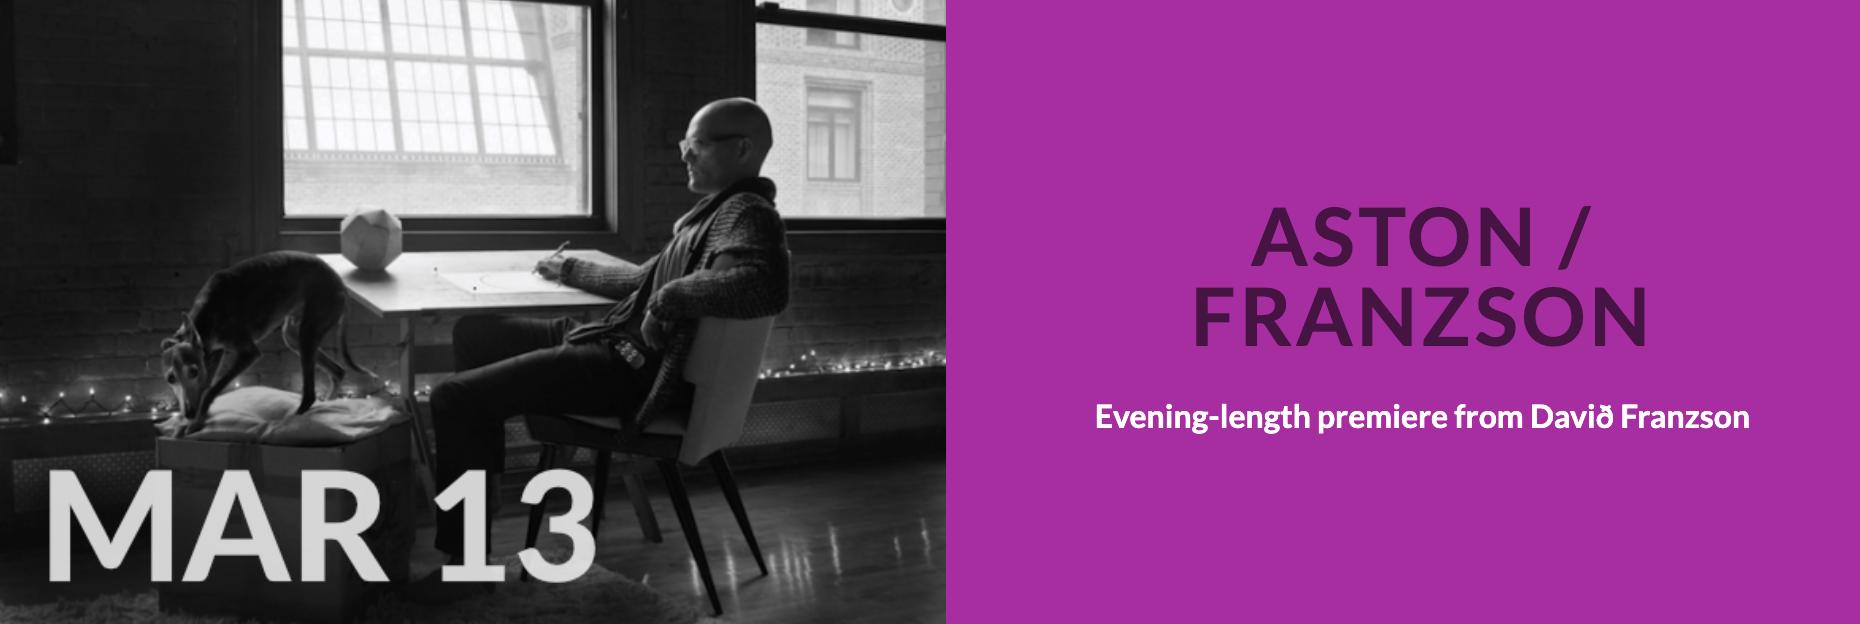 event image for wasteLAnd – Aston / Franzson